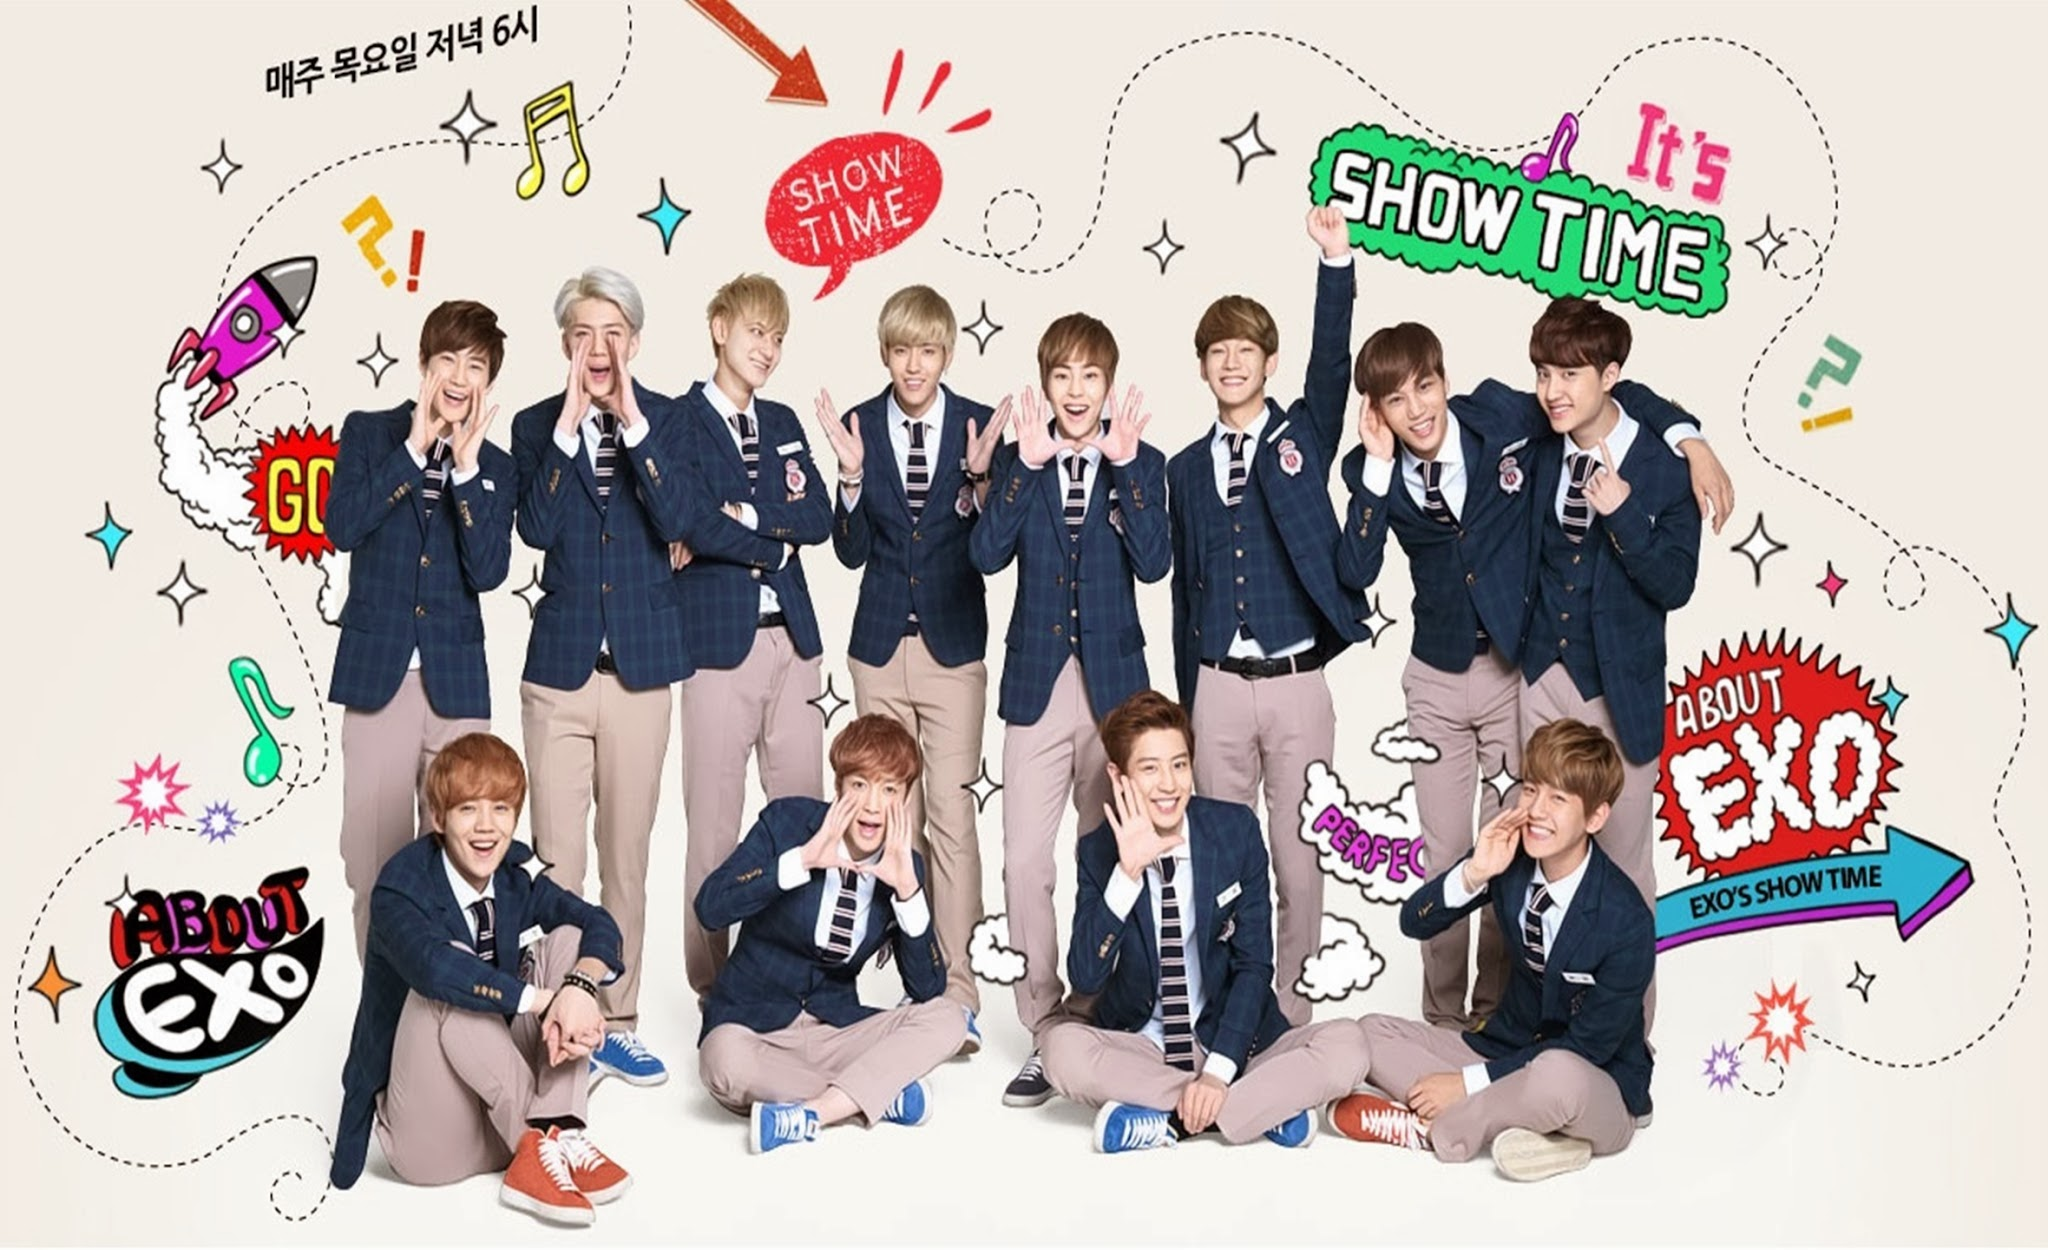 exo showtime